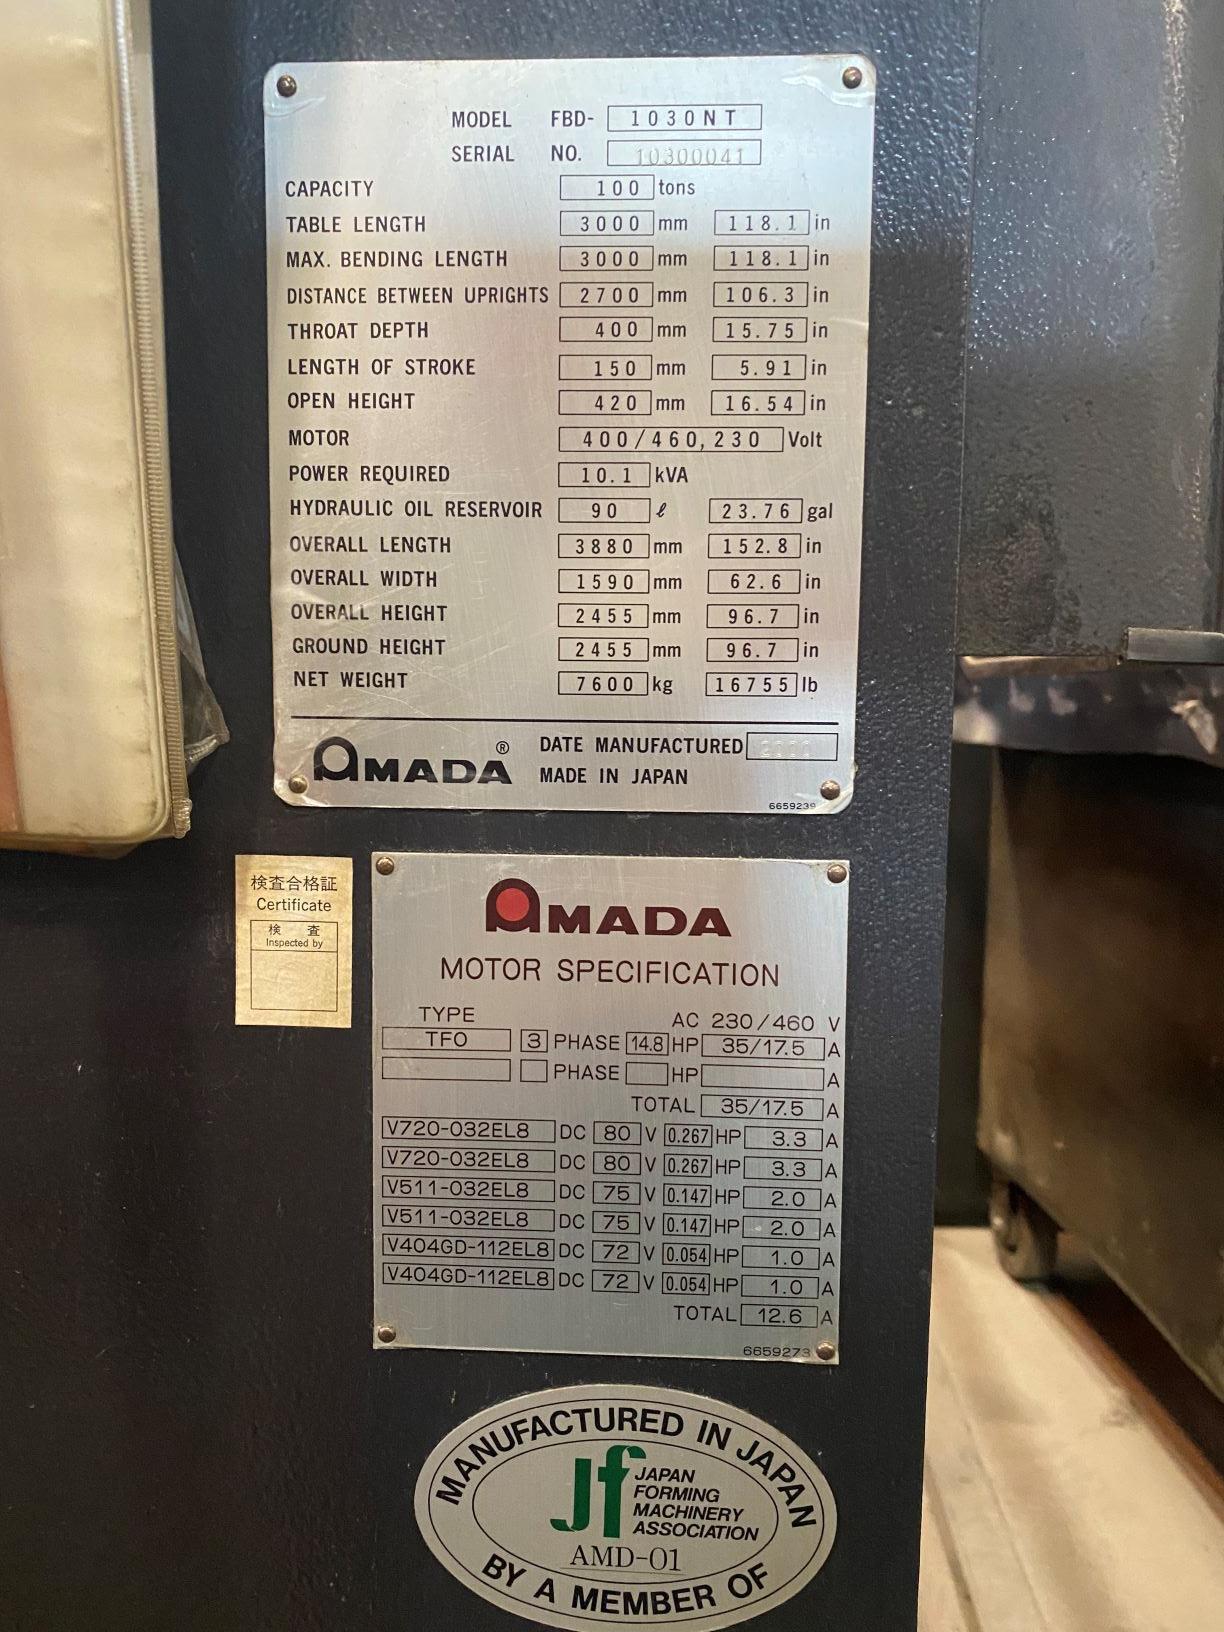 AMADAAmada FBD1030NT 110 TONS X 10',  8 -AXIS AMADA NT-CNC CONTROLS